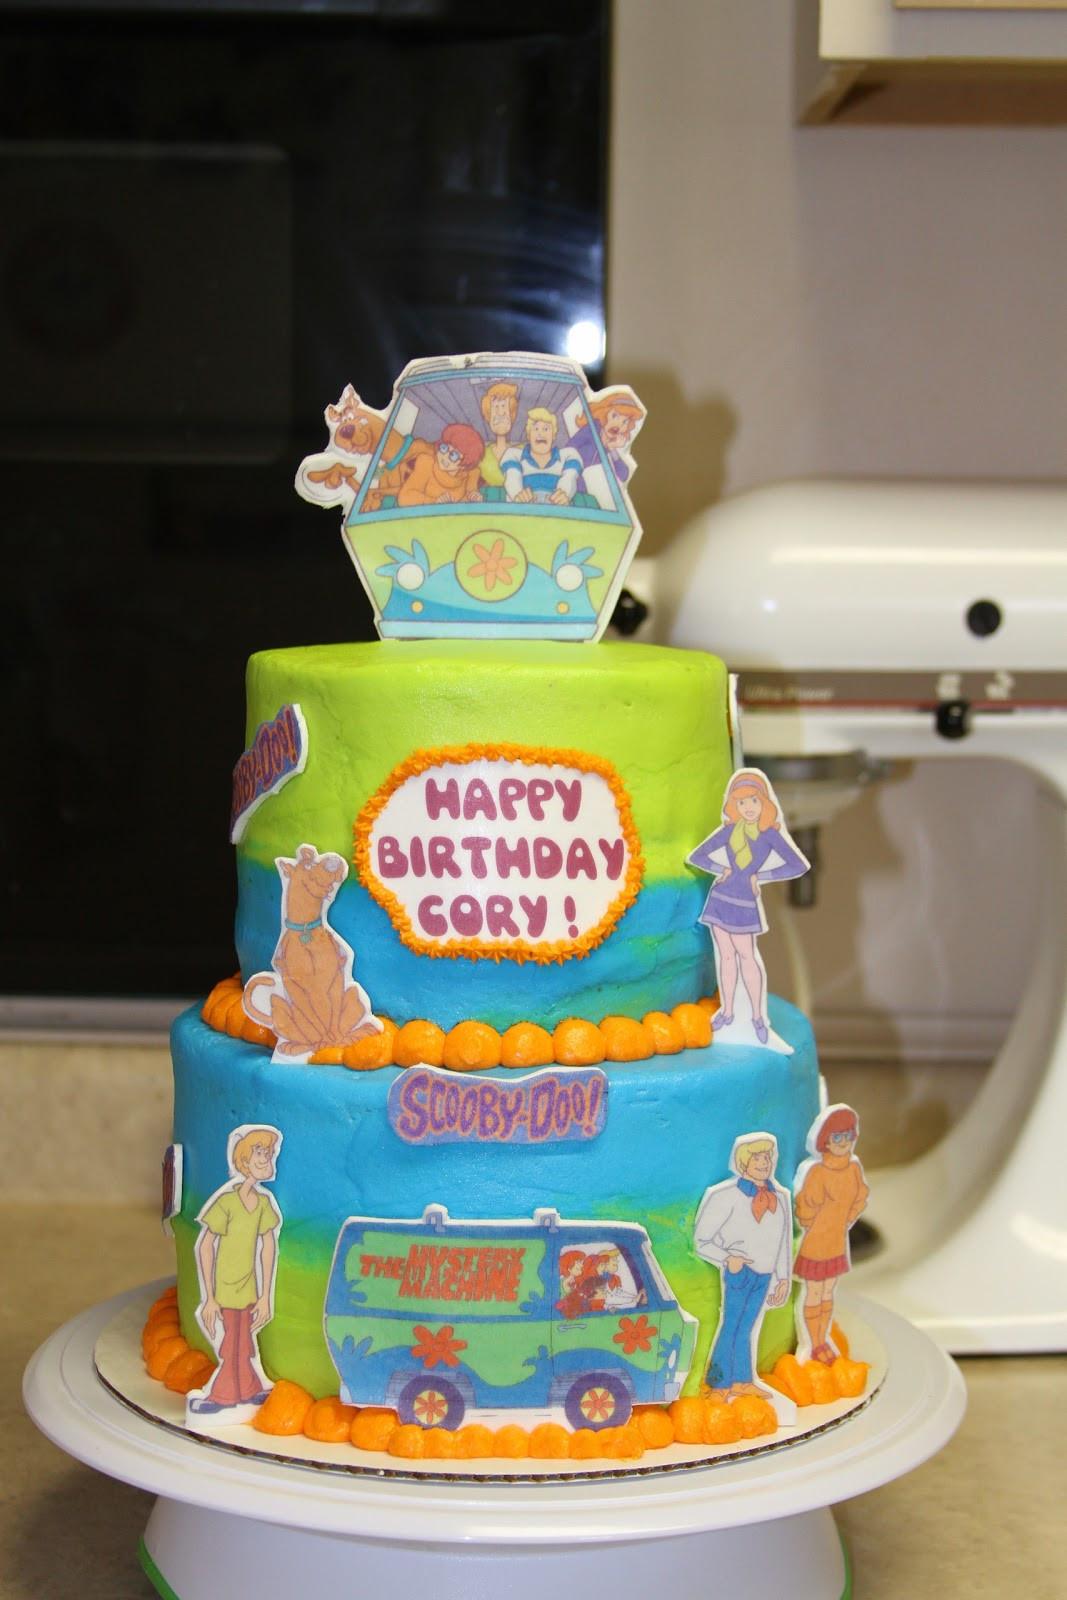 Scooby Doo Birthday Cakes  Michele Robinson Cakes Scooby Doo Cake